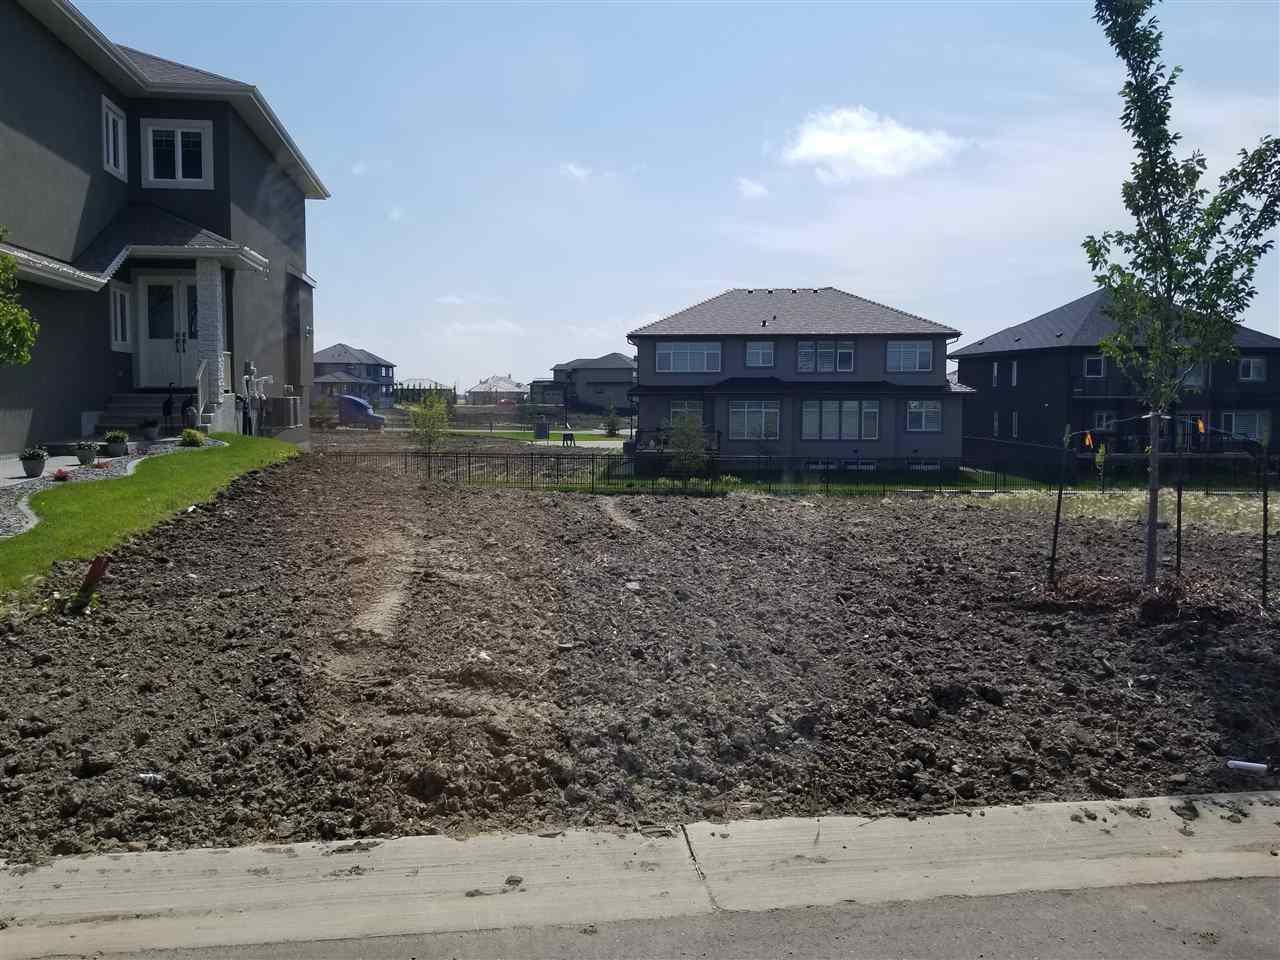 Main Photo: 3043 58 Avenue: Rural Leduc County Rural Land/Vacant Lot for sale : MLS®# E4224013